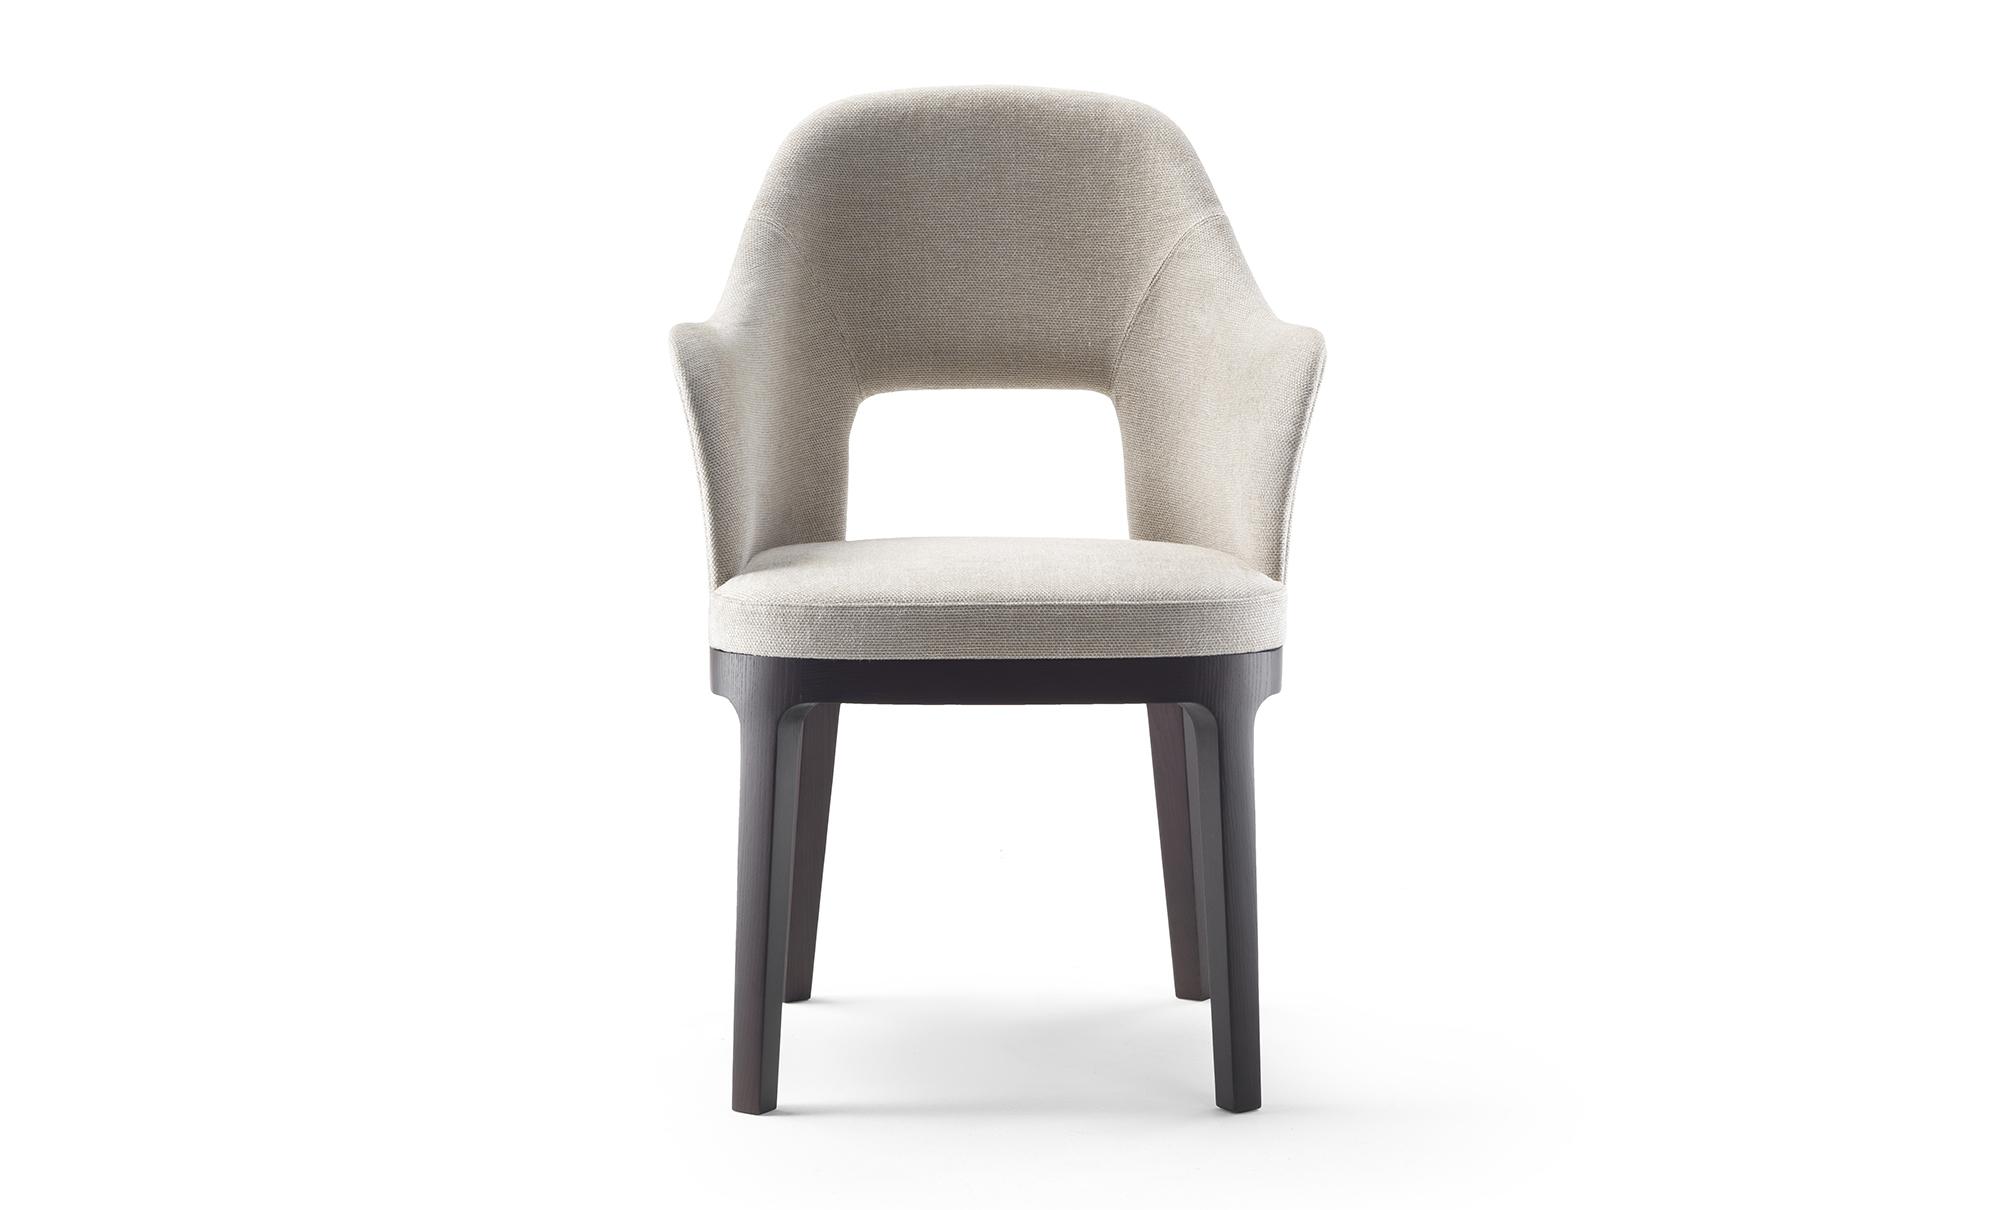 Designer Dining Chairs Sydney & Melbourne Dining Room Furniture